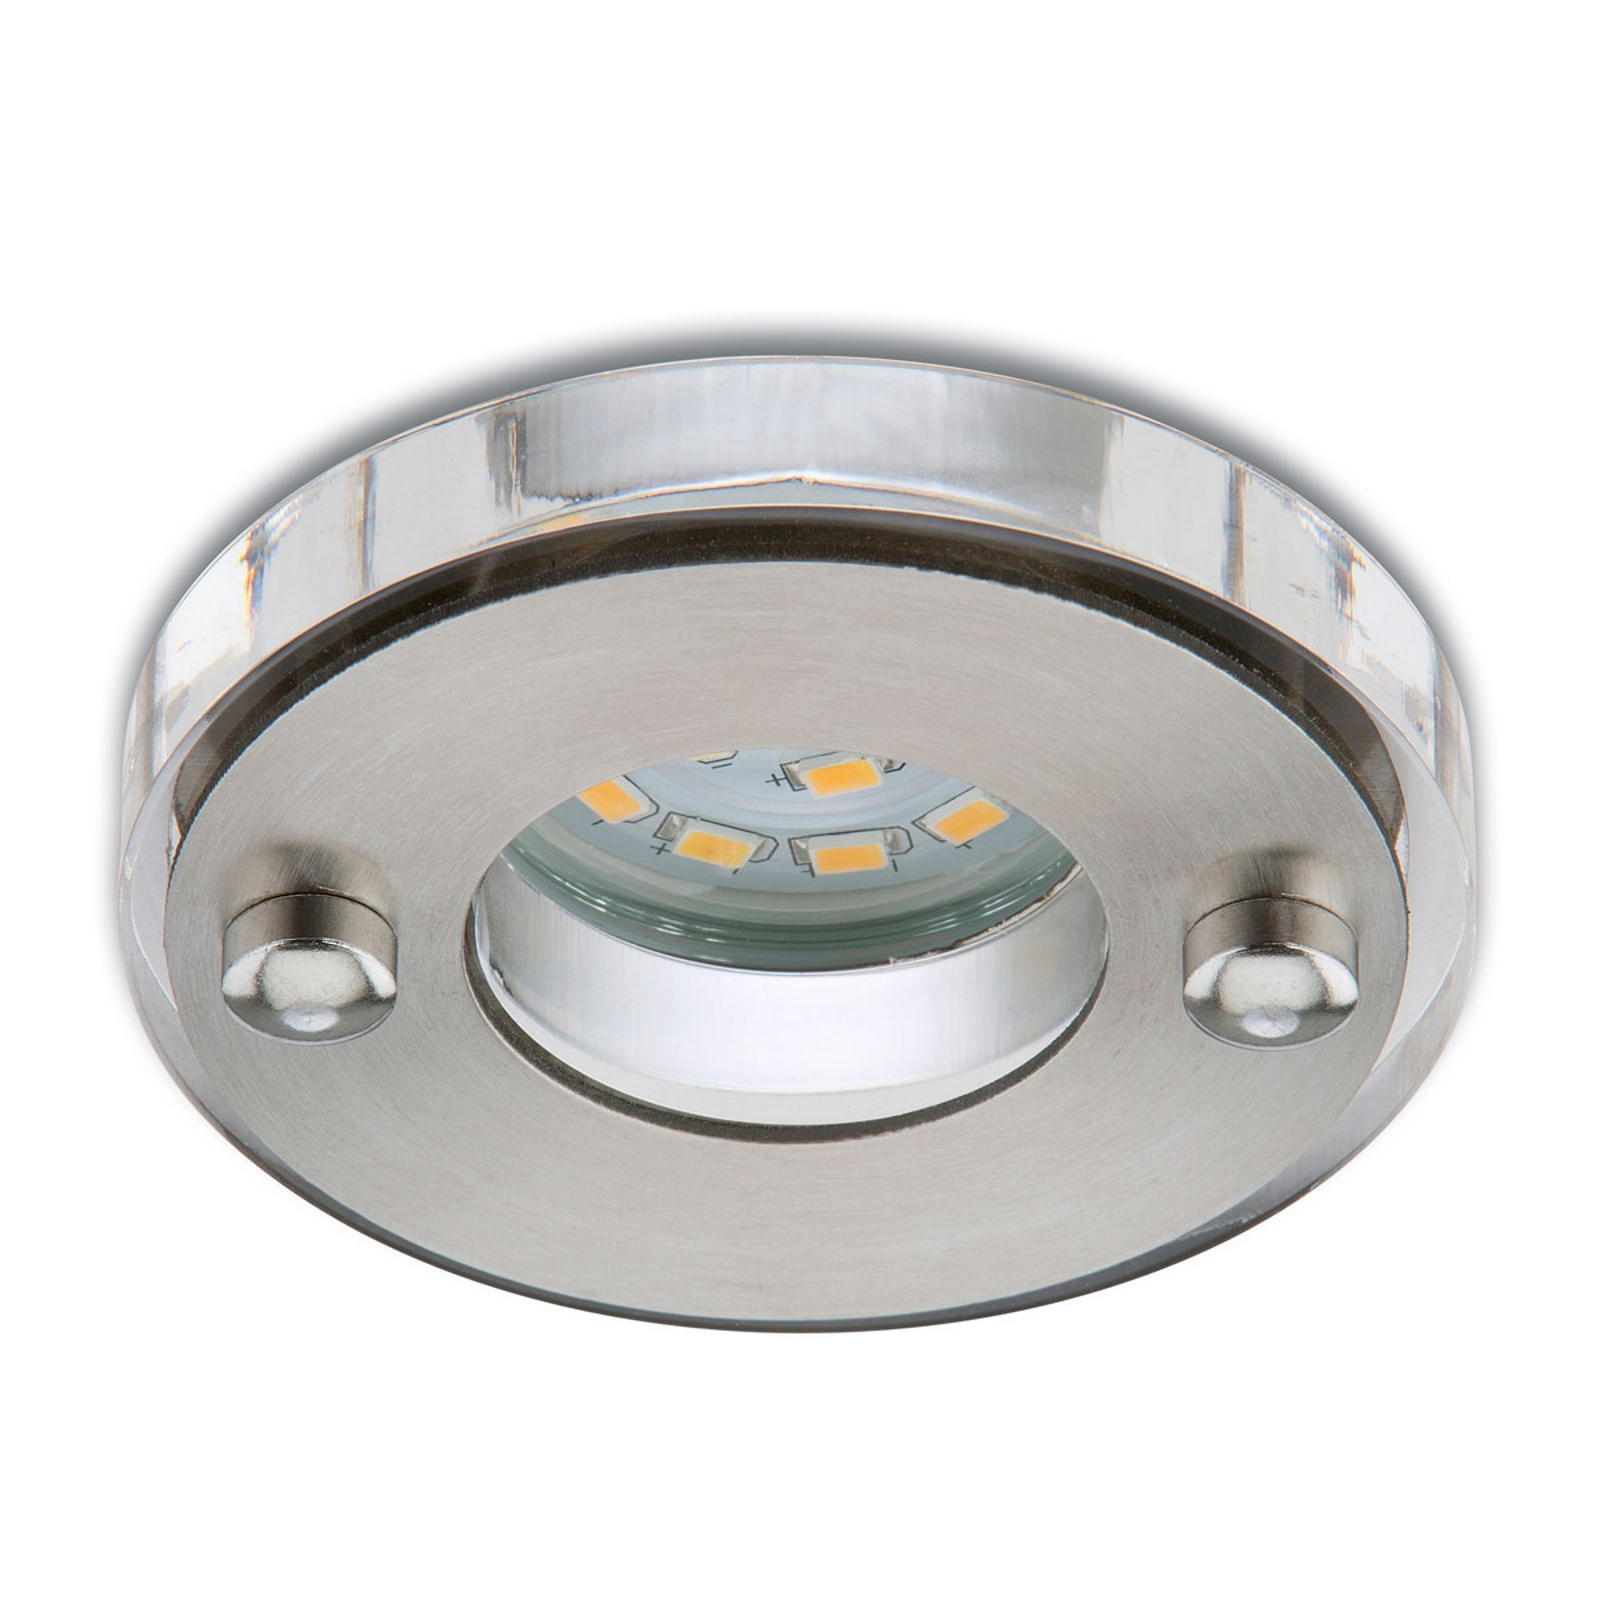 Faretto LED incasso Nikas IP23 nichel satinato